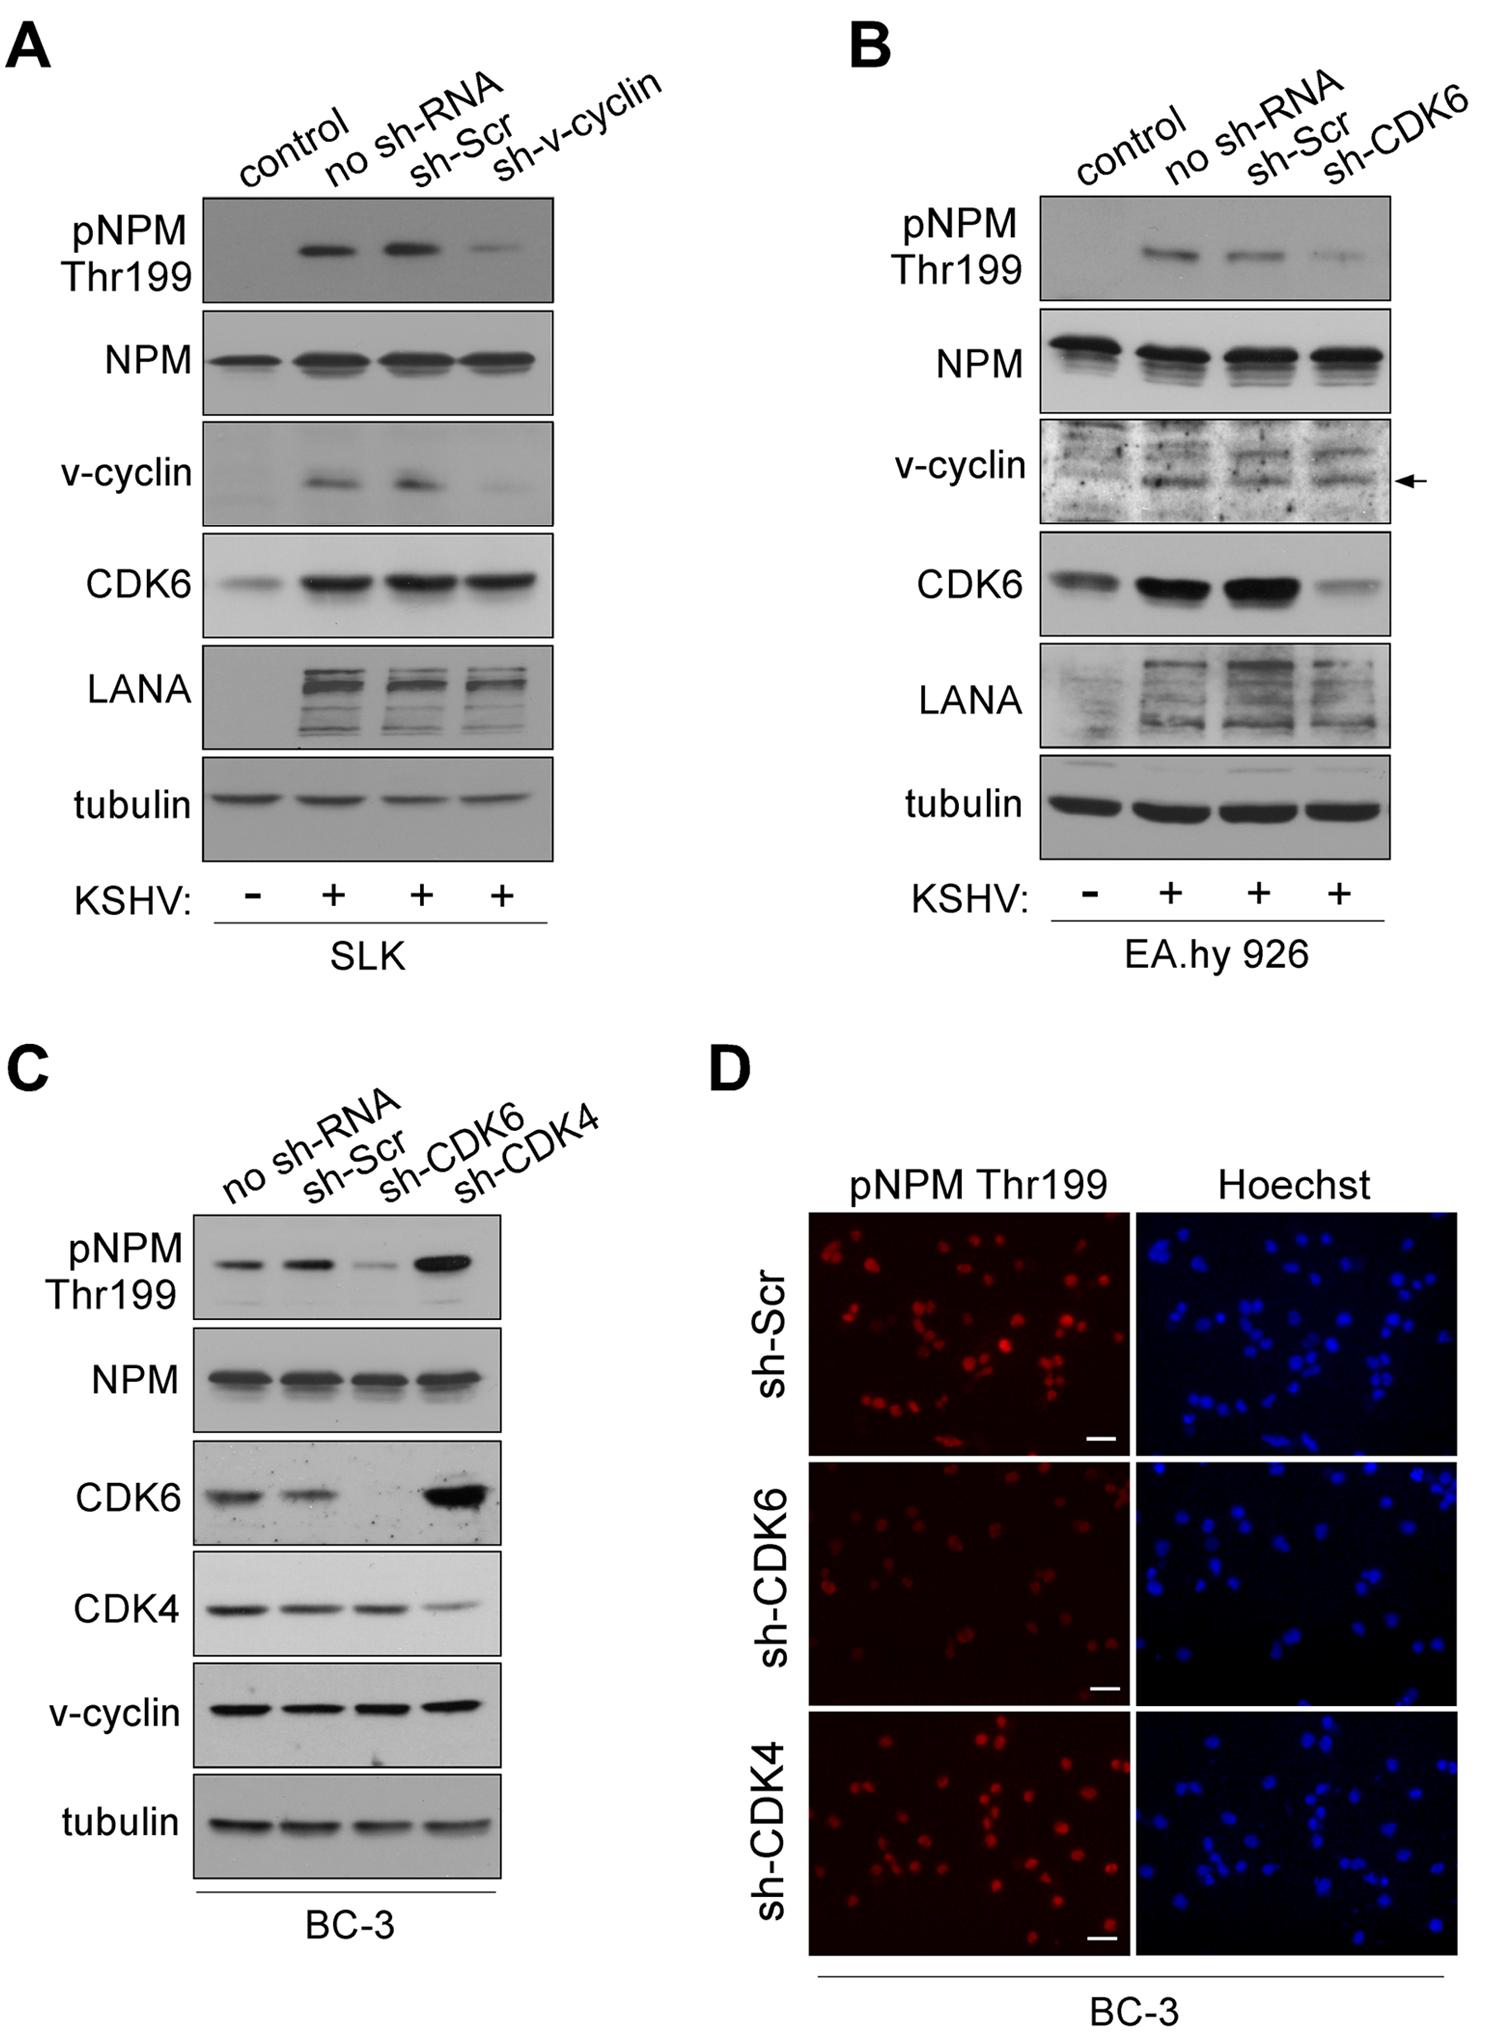 NPM phosphorylation is dependent on v-cyclin-CDK6 activity.